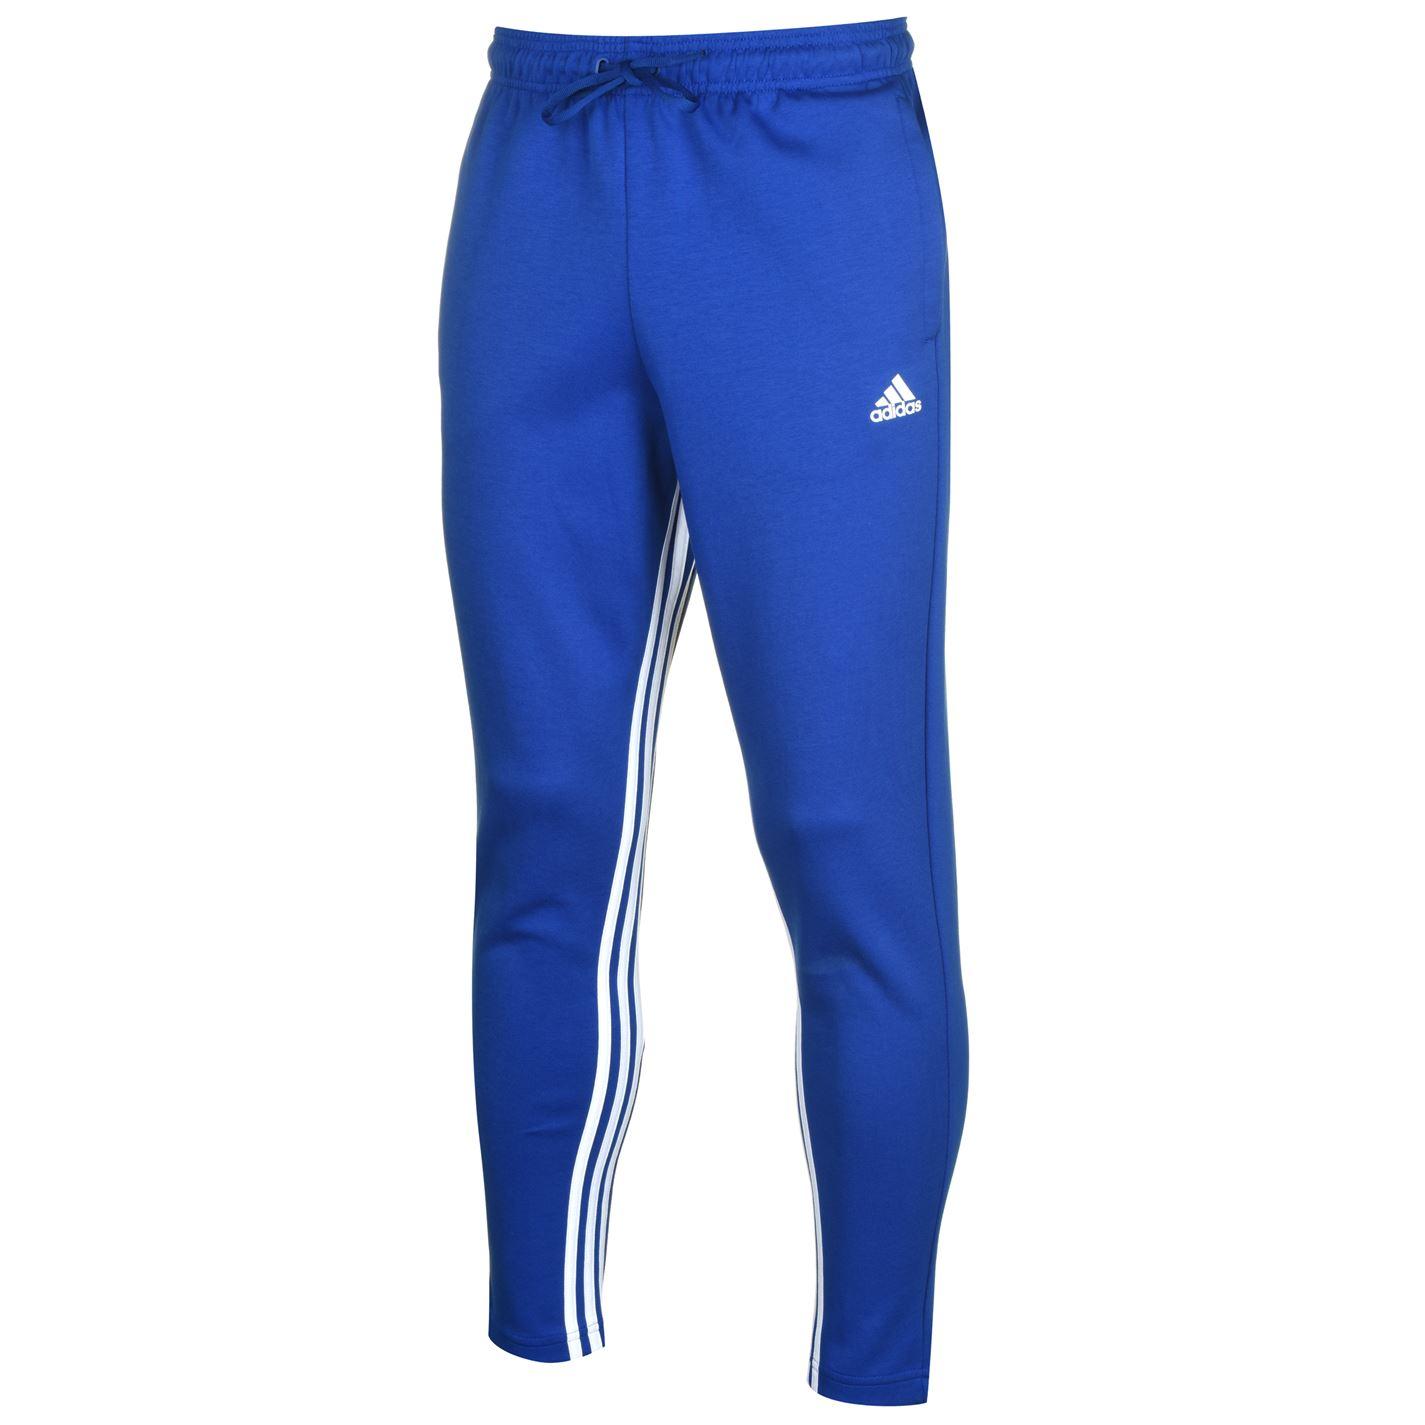 Adidas 3 Stripe Sweat Pants Mens